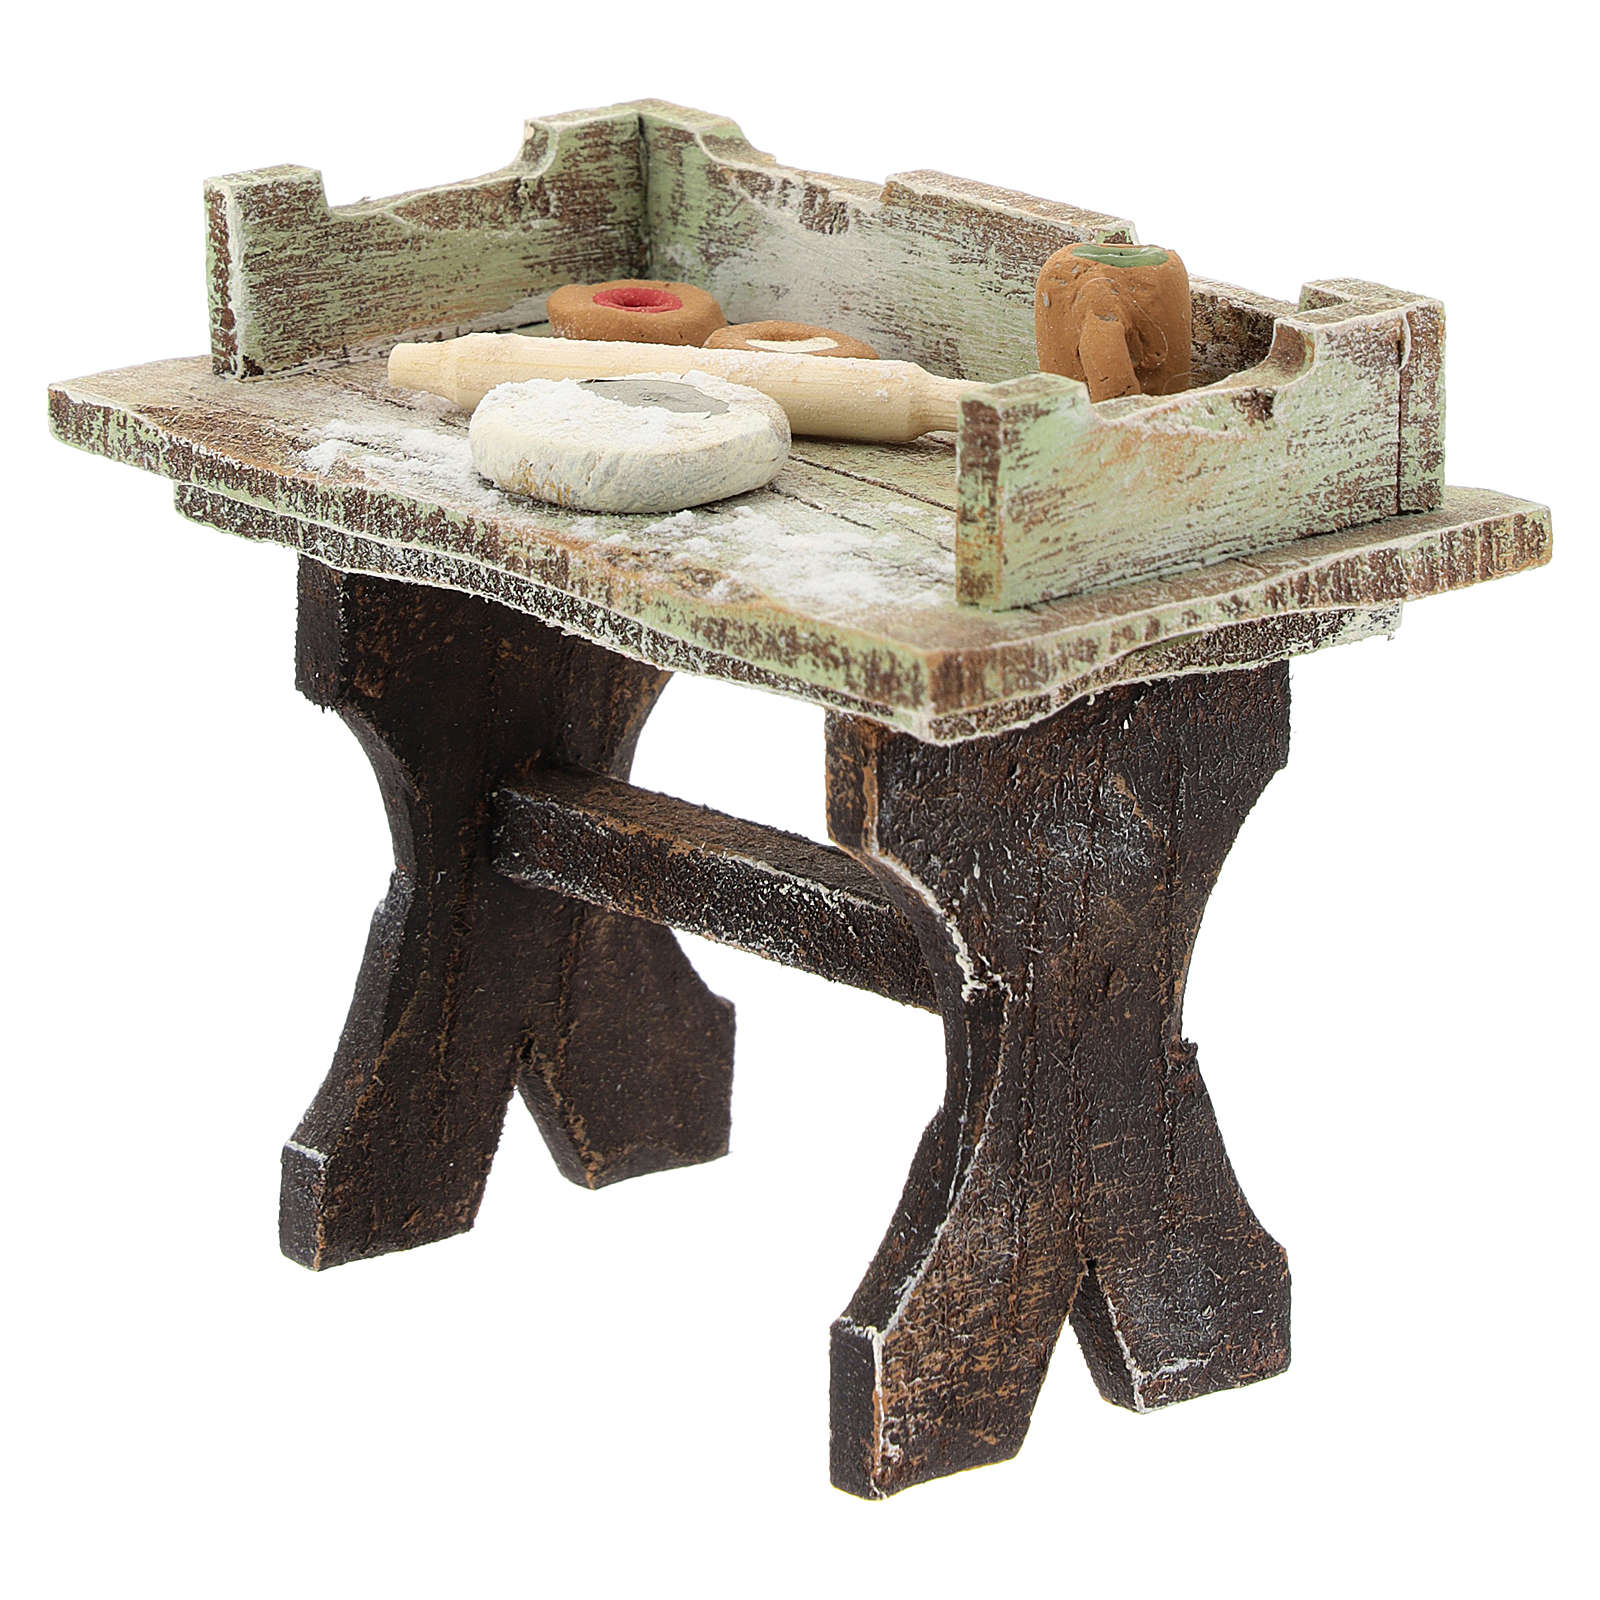 Pizza-maker table for 12 cm Nativity scene 4